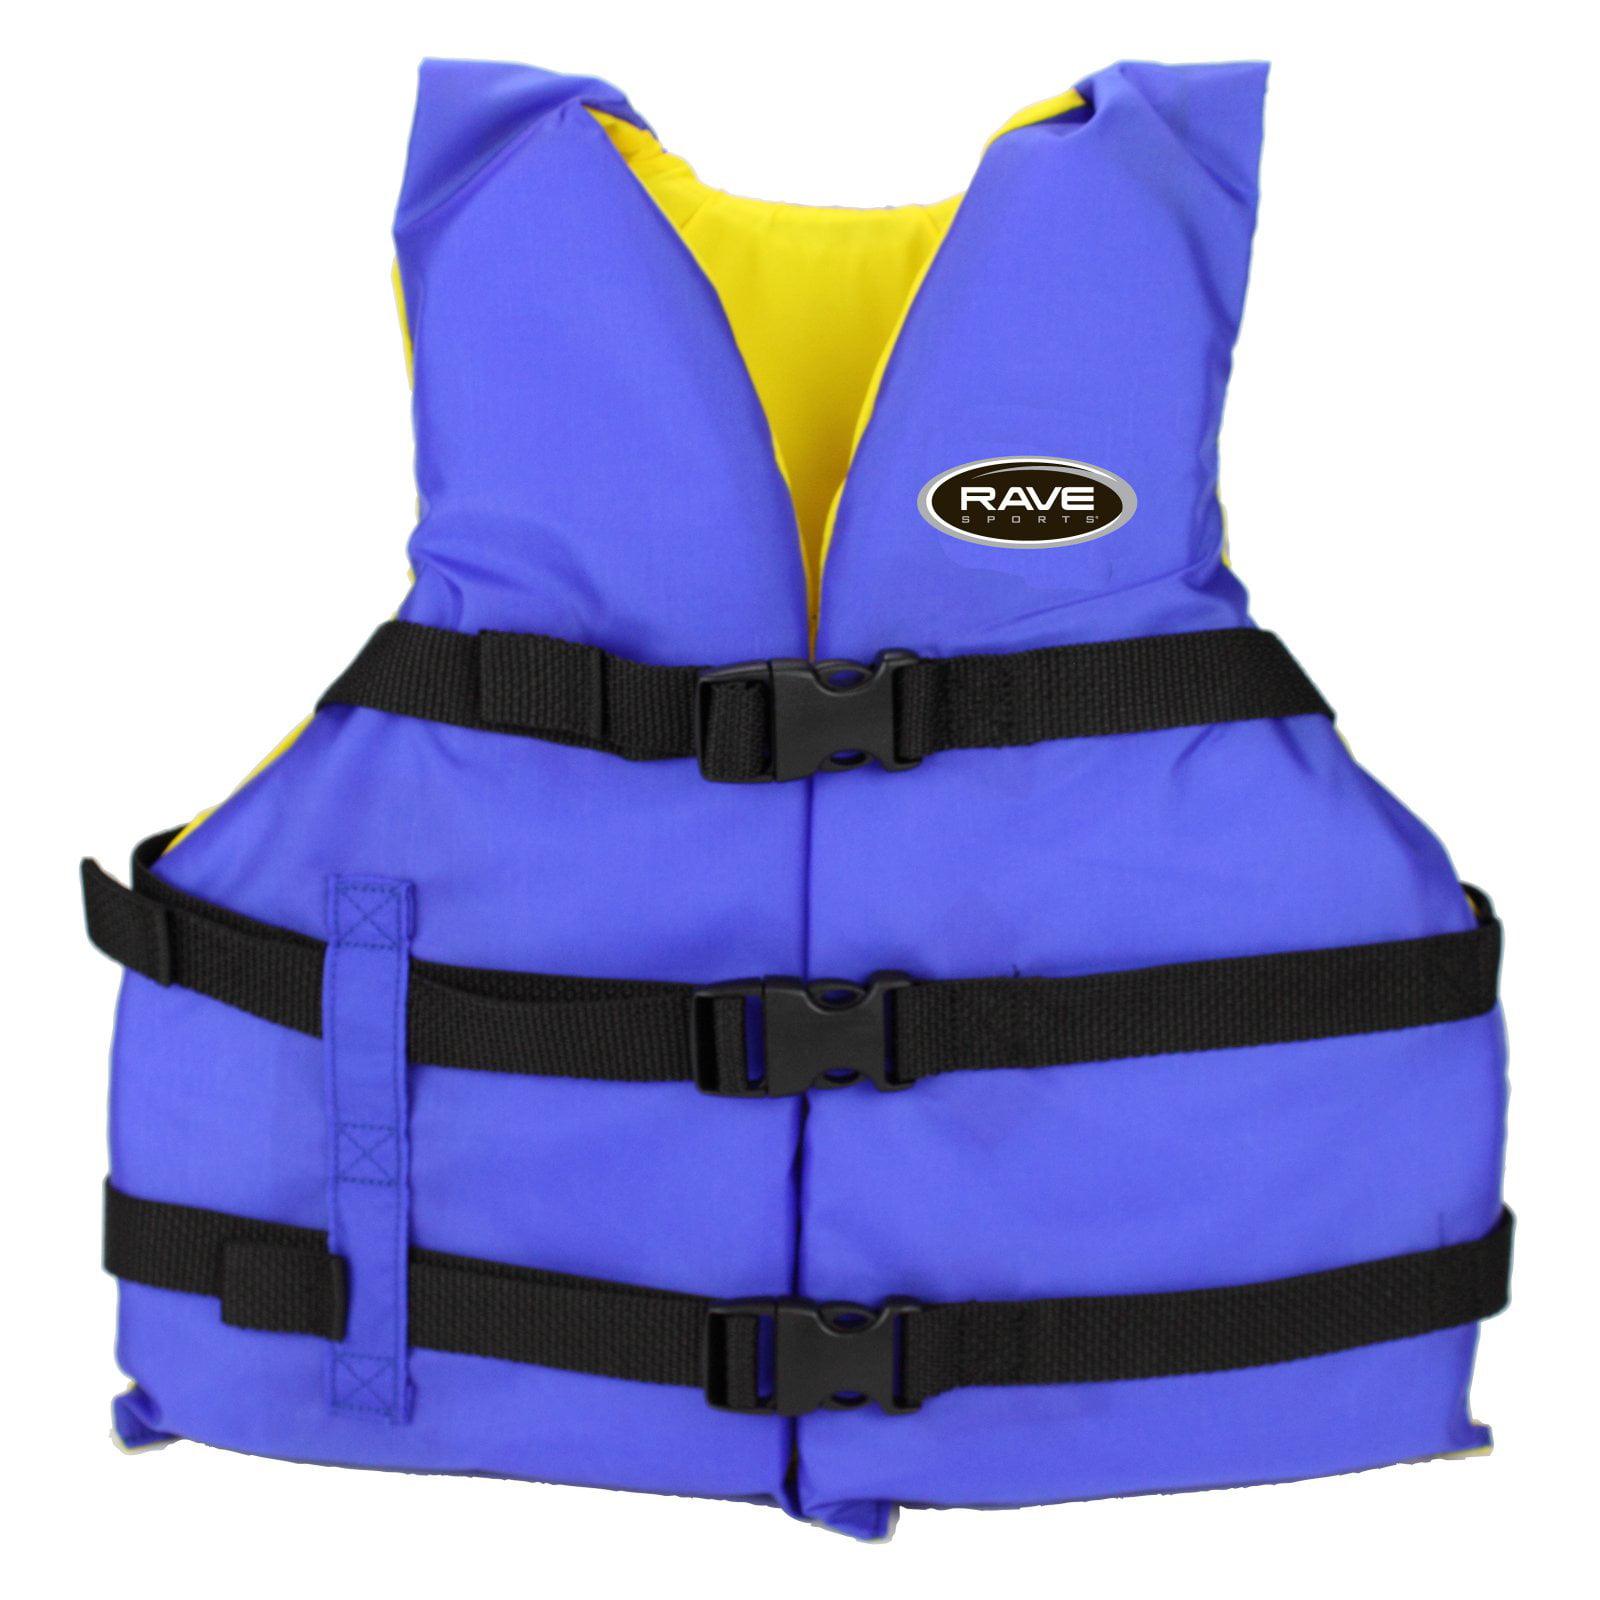 Rave Sport Universal Nylon PFD Adult Life Jacket, Blue